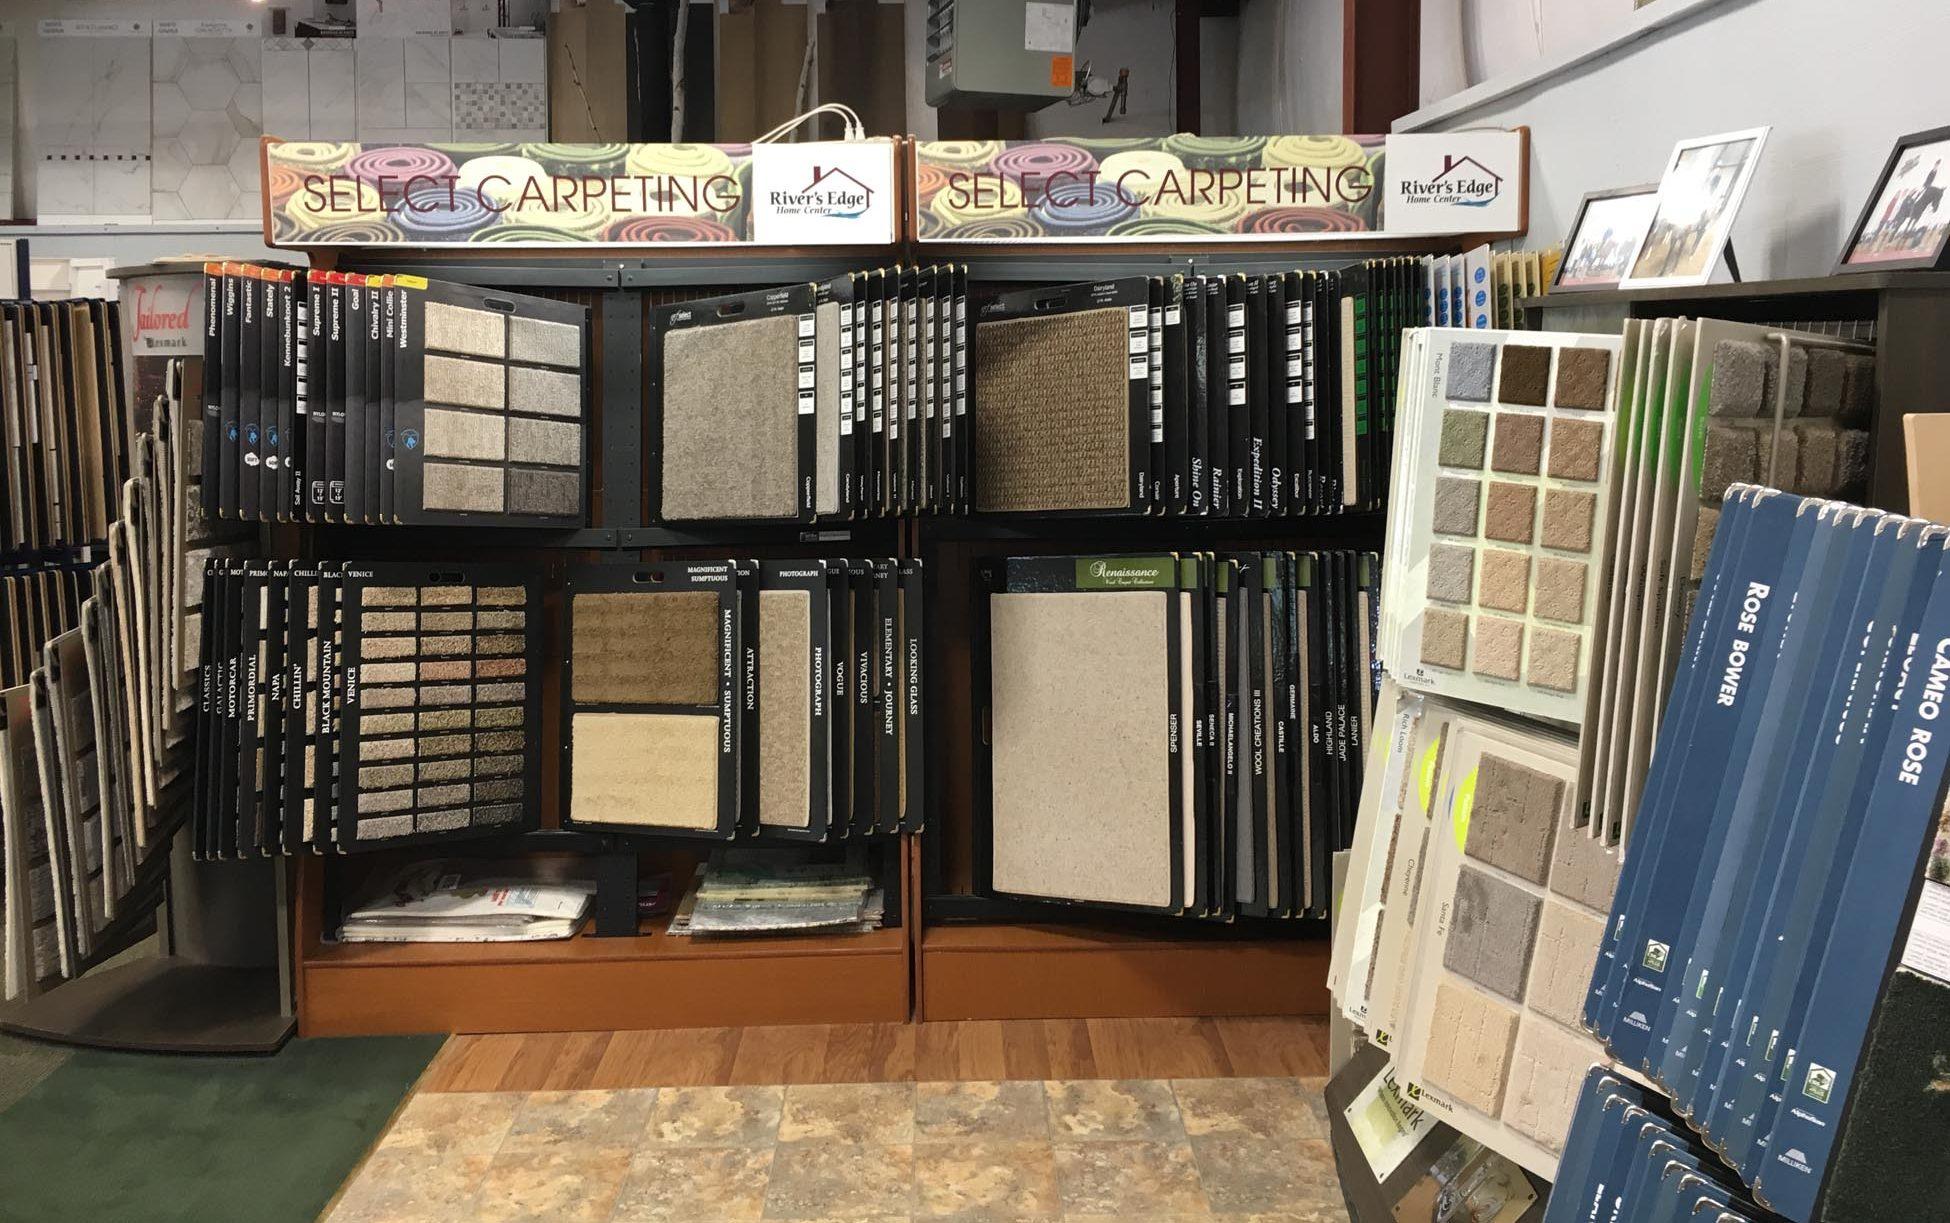 River's Edge Home Center Carpeting Store